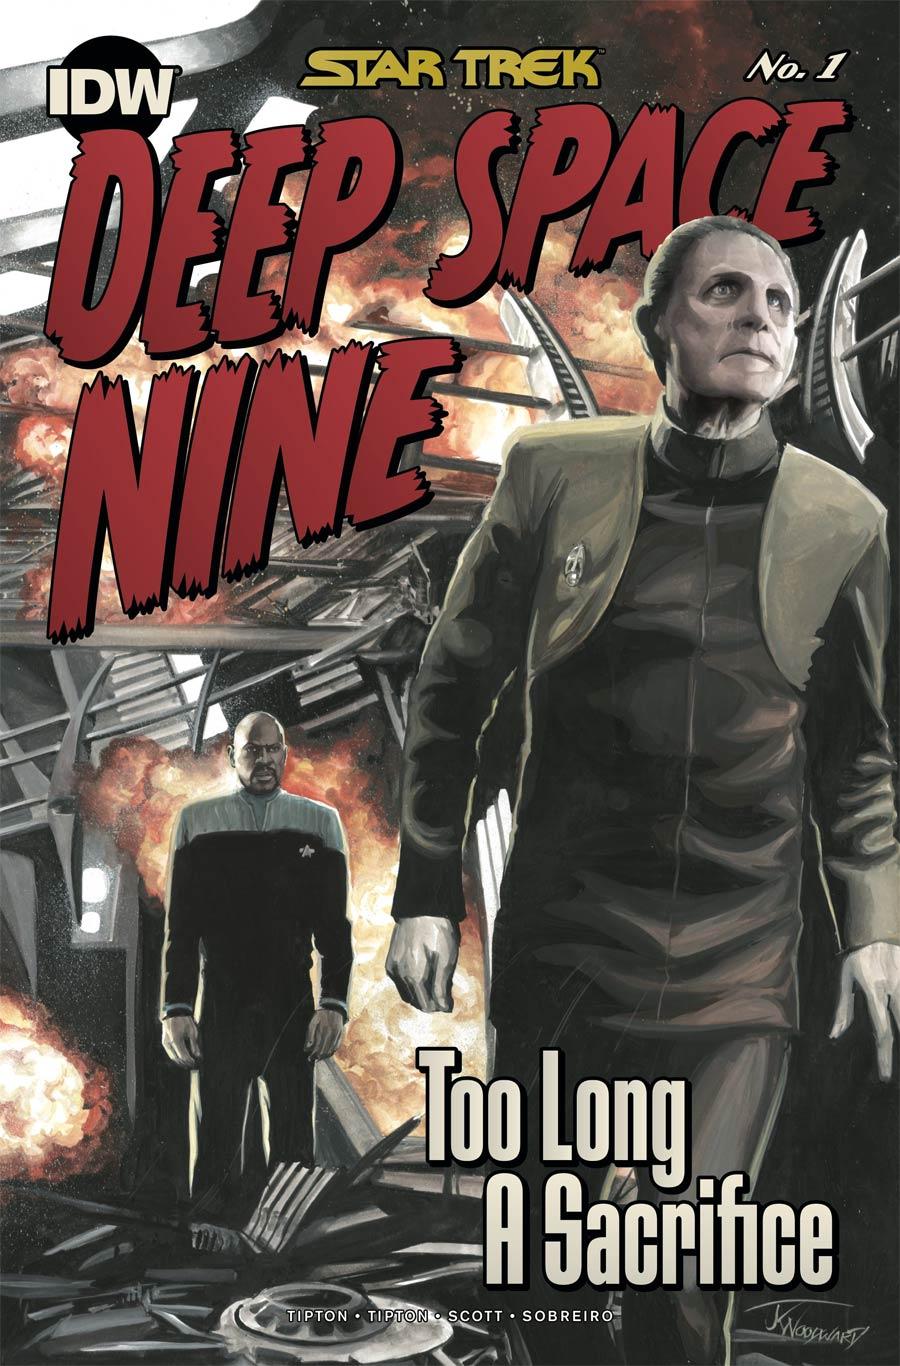 Star Trek Deep Space Nine Too Long A Sacrifice #1 Cover C Incentive JK Woodward Variant Cover